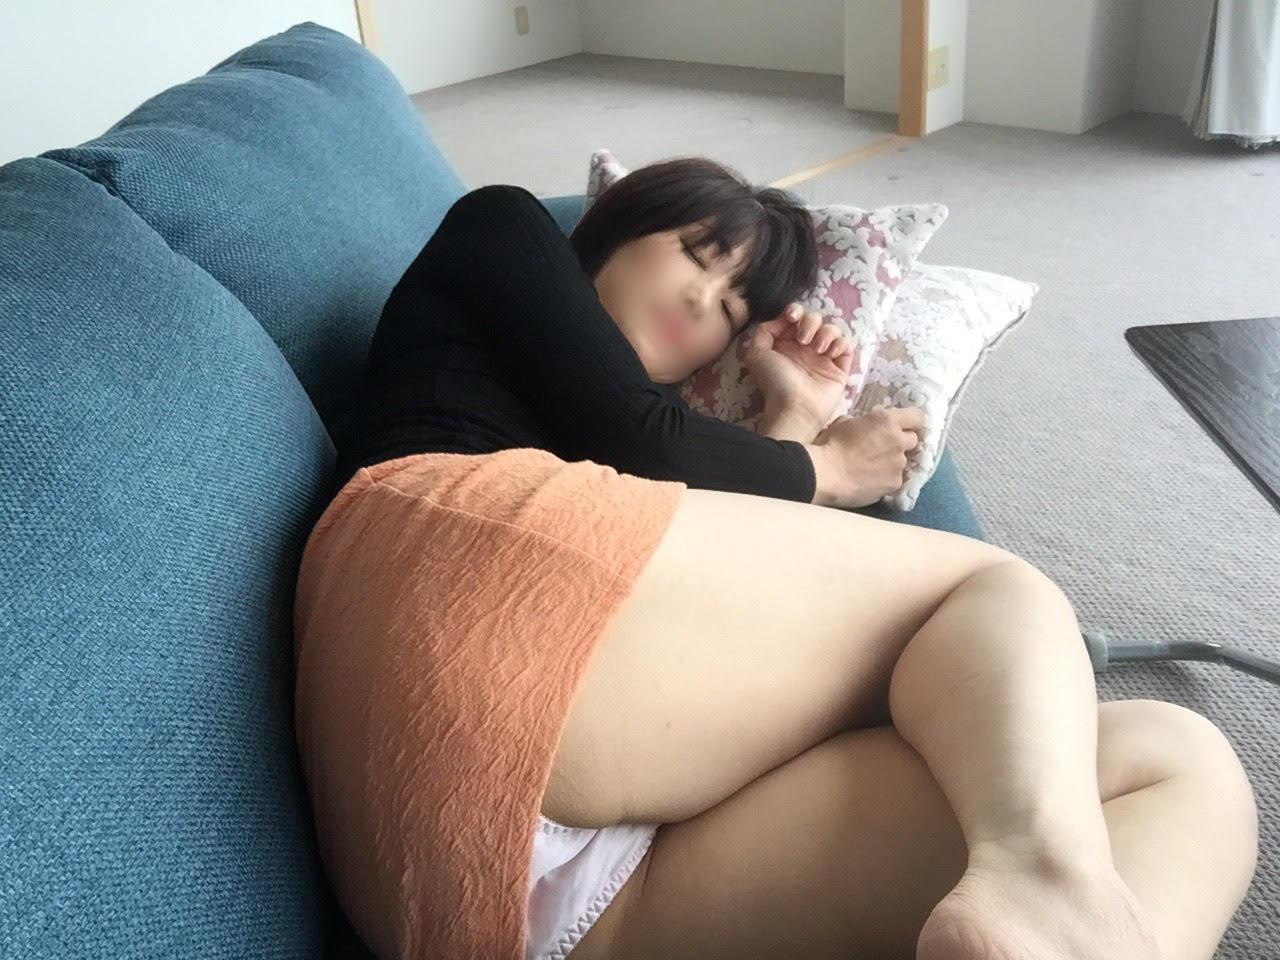 kyokocomちゃん  - 人妻系  アダルトチャットガール